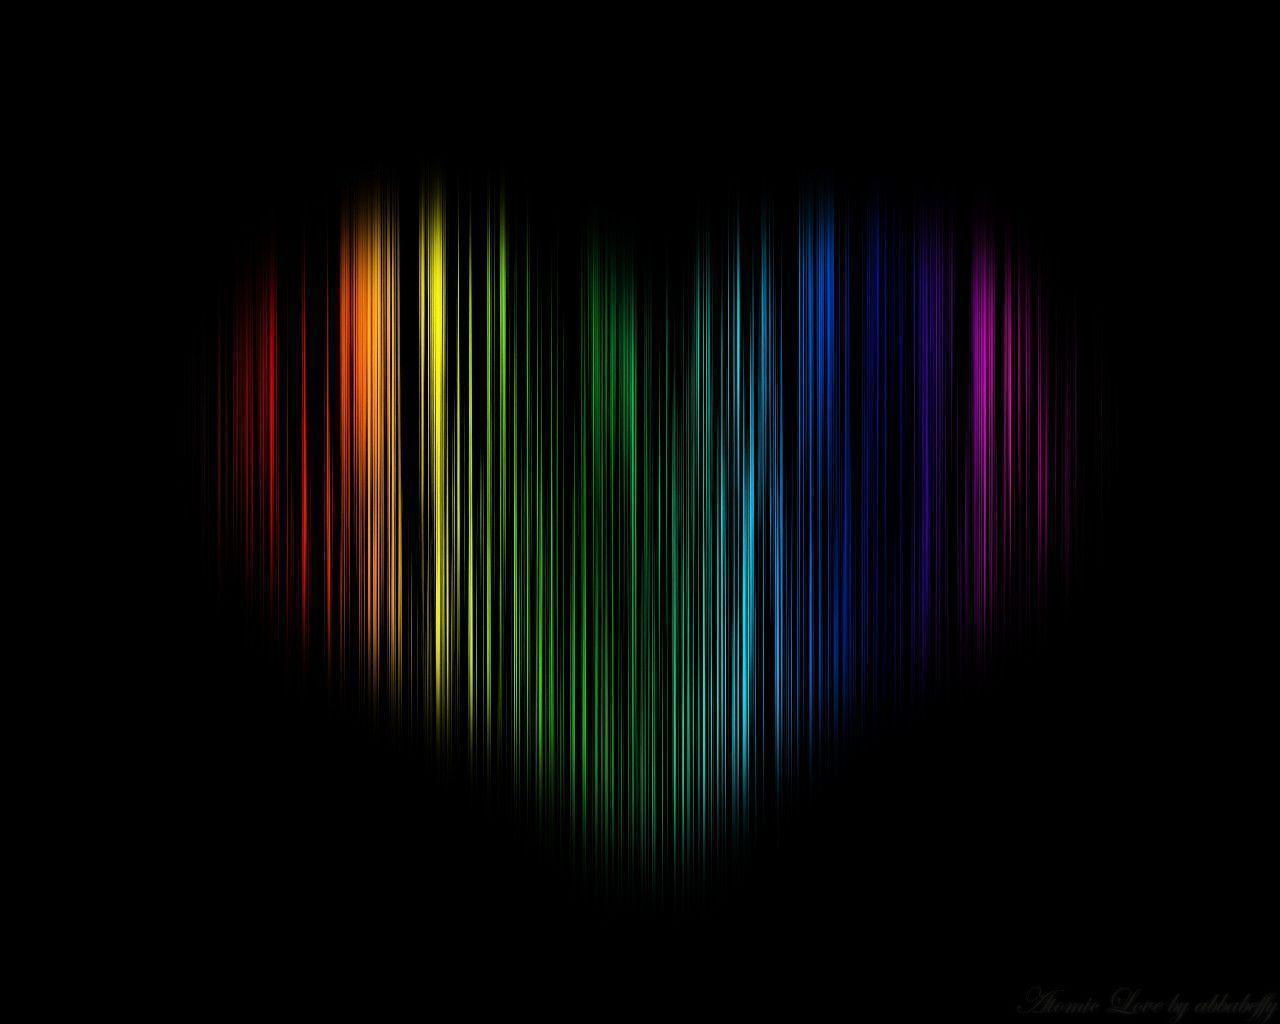 Rainbow 2048 Pixels Wide And 1152 Pixels Tall